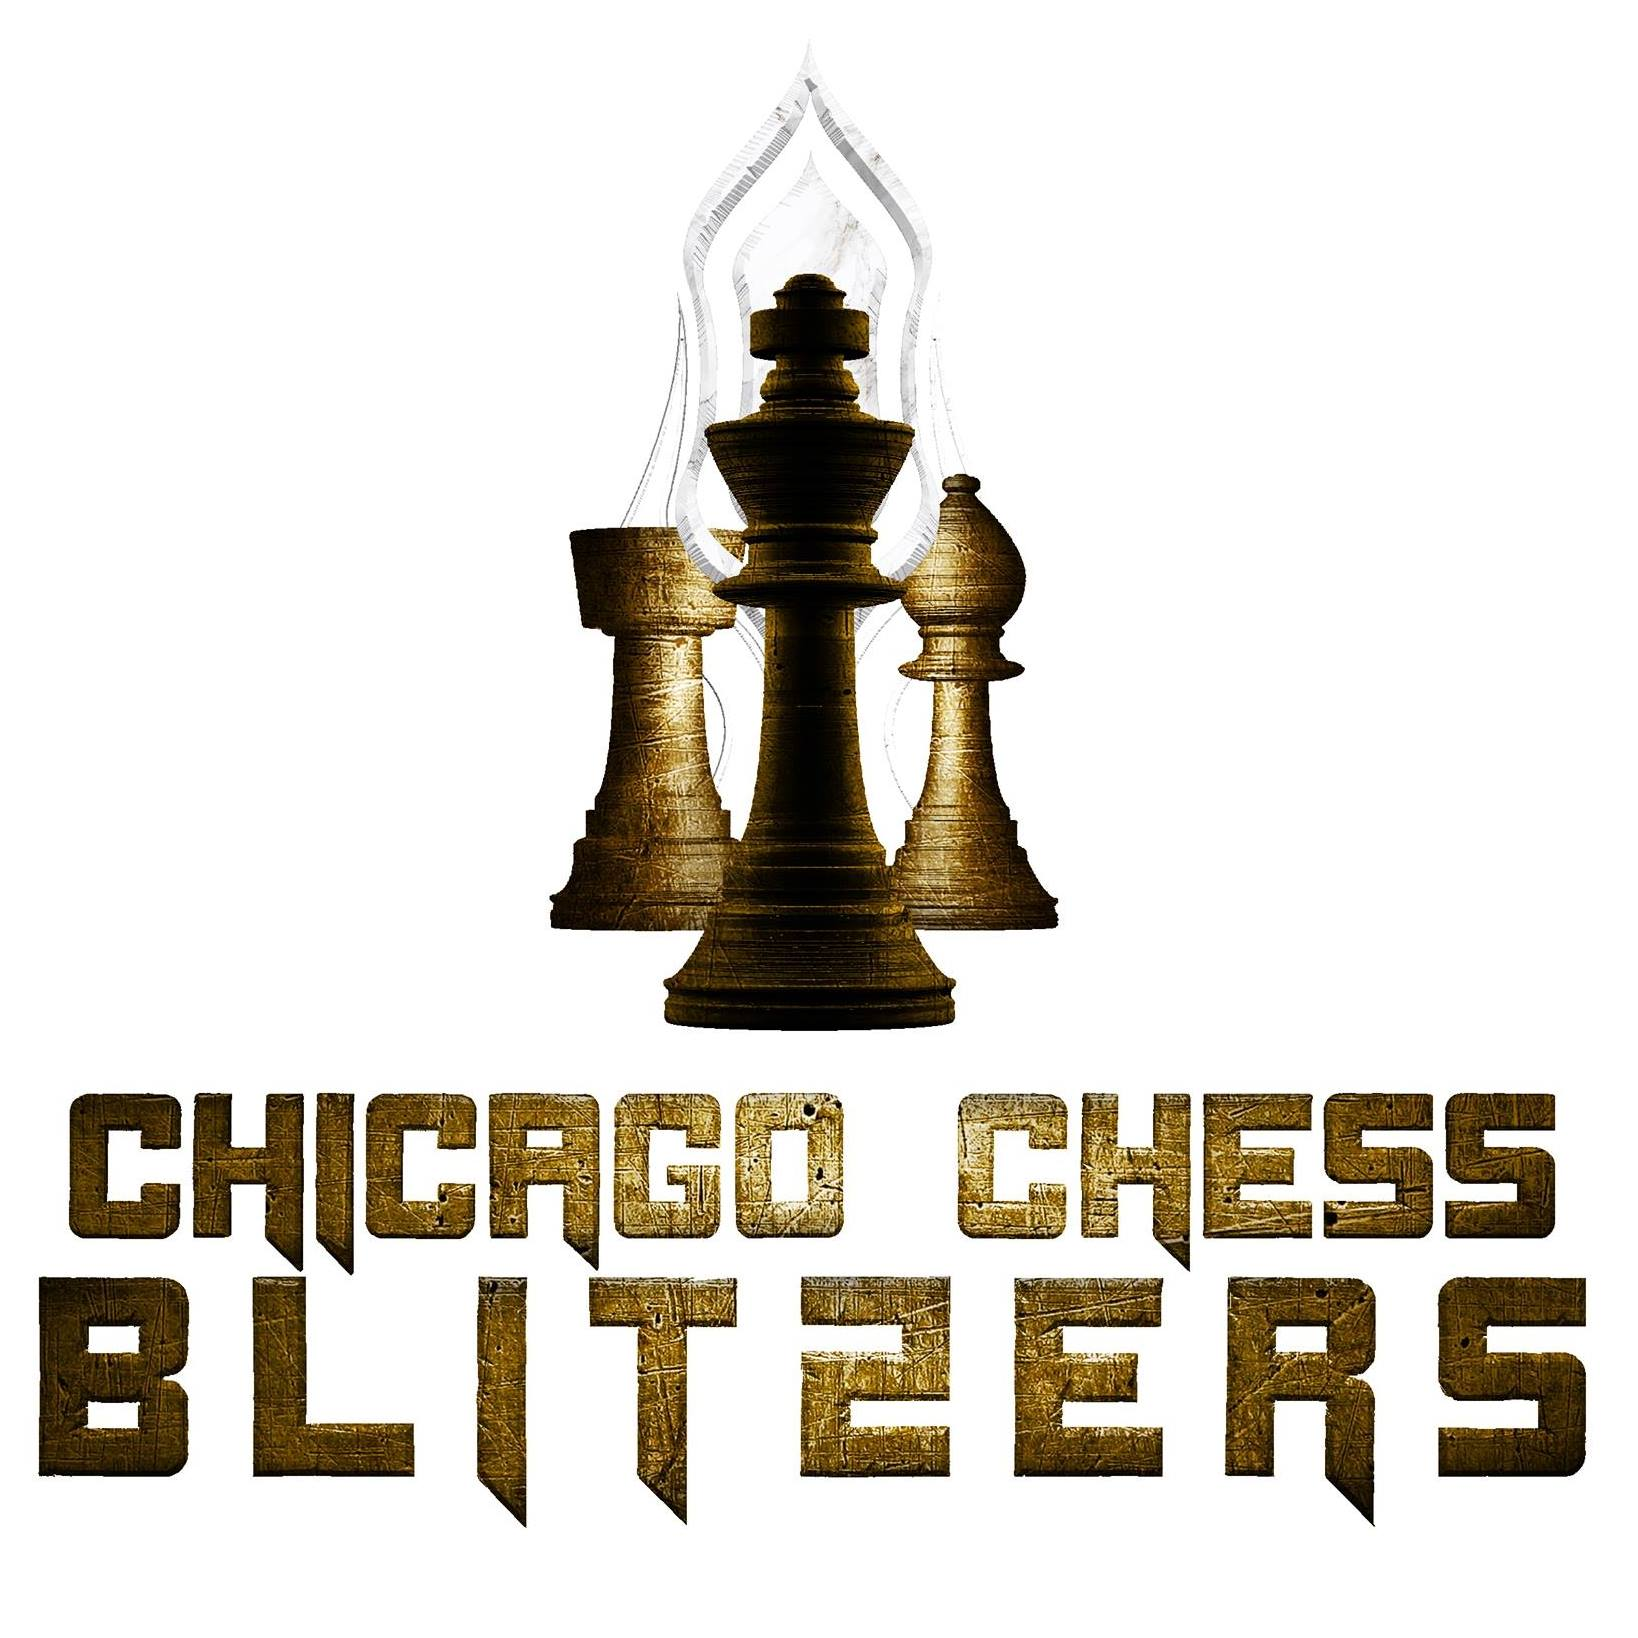 Chicago CC to host GM Ramirez | The Chess Drum